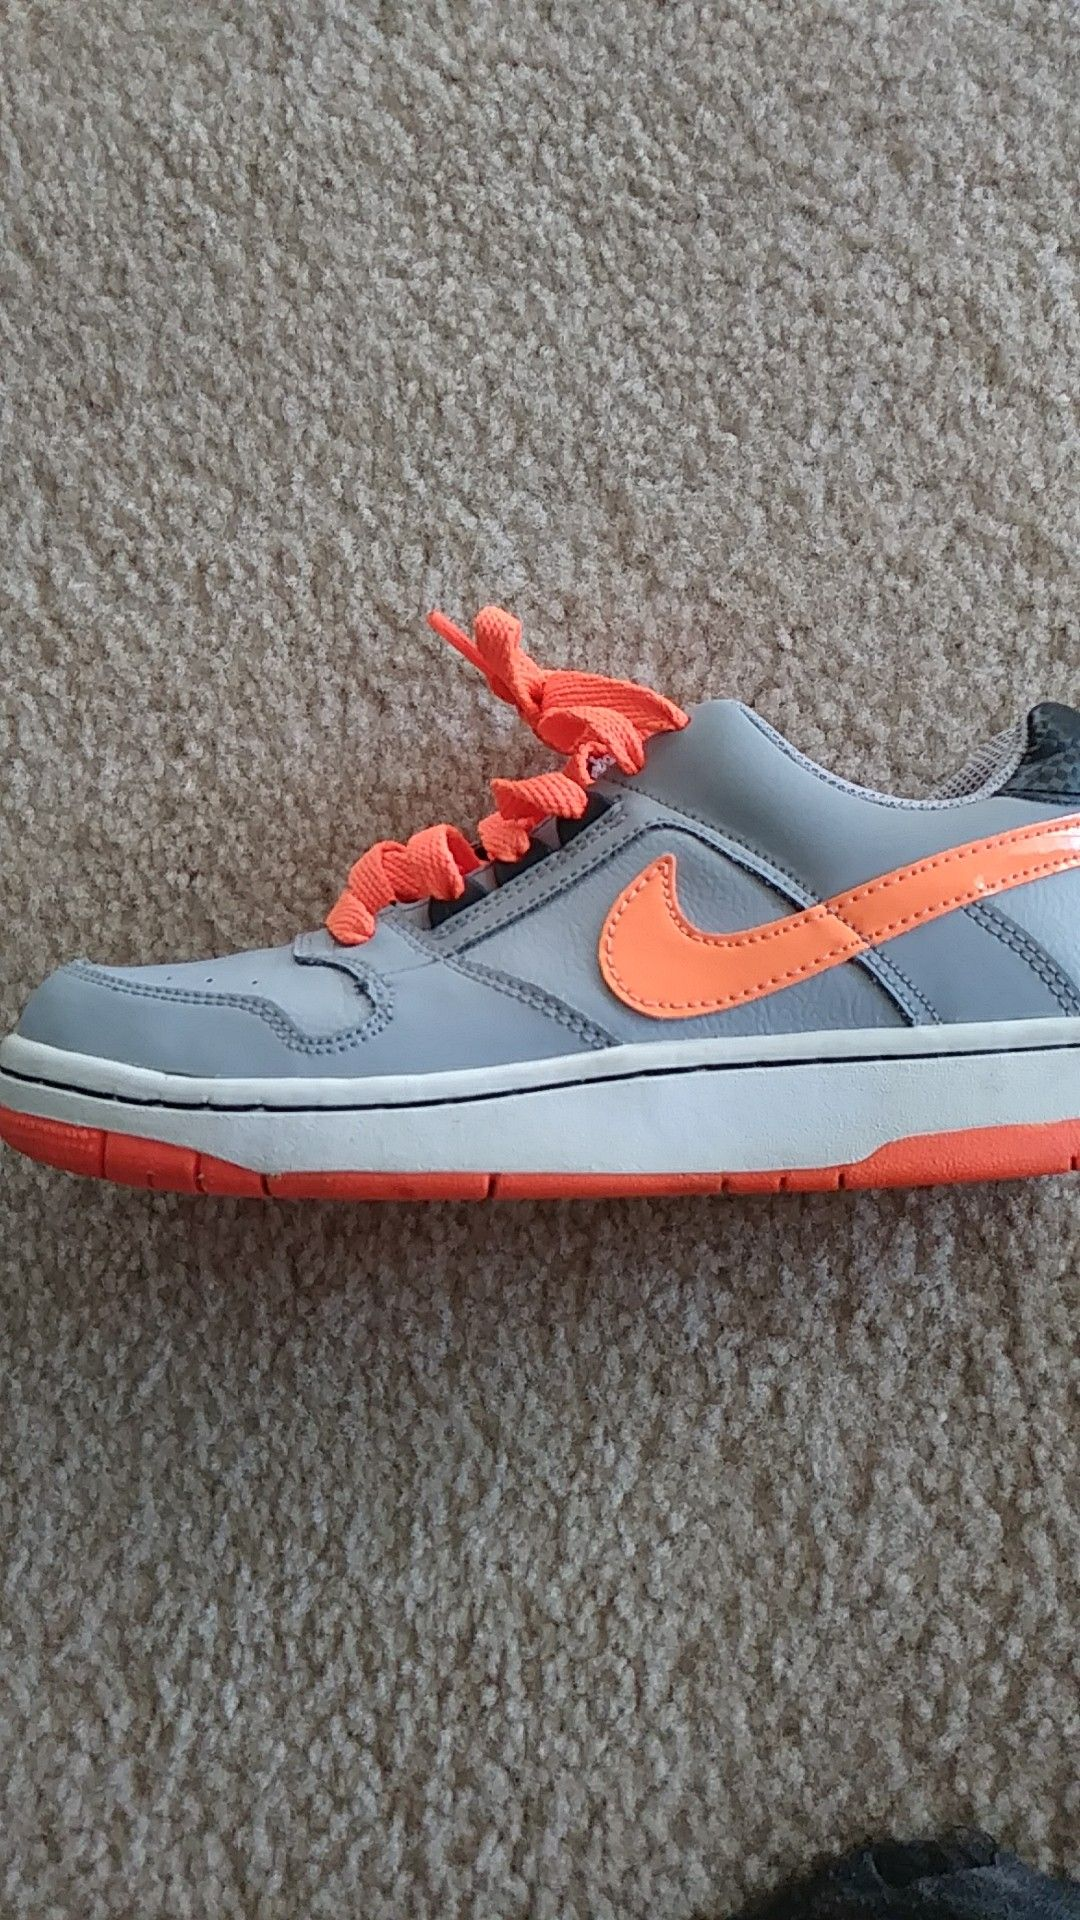 Nike size 4.5 boys